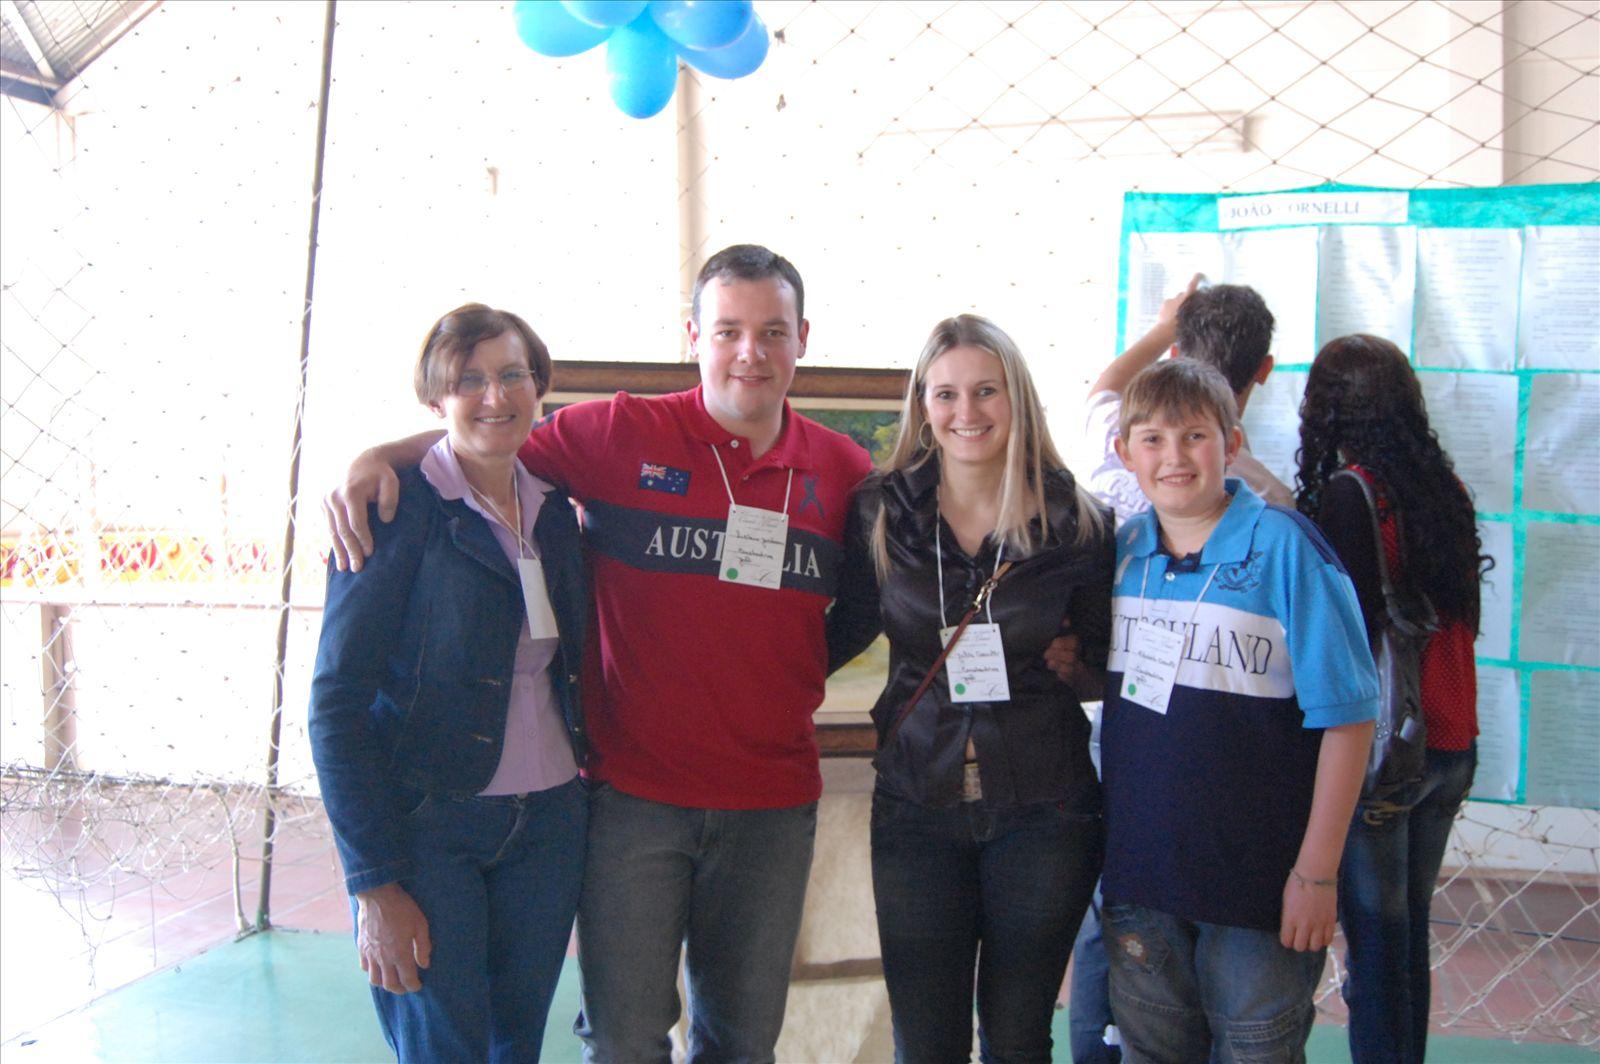 2º Encontro Família Cornelli - 11.10.2009 (34)_0